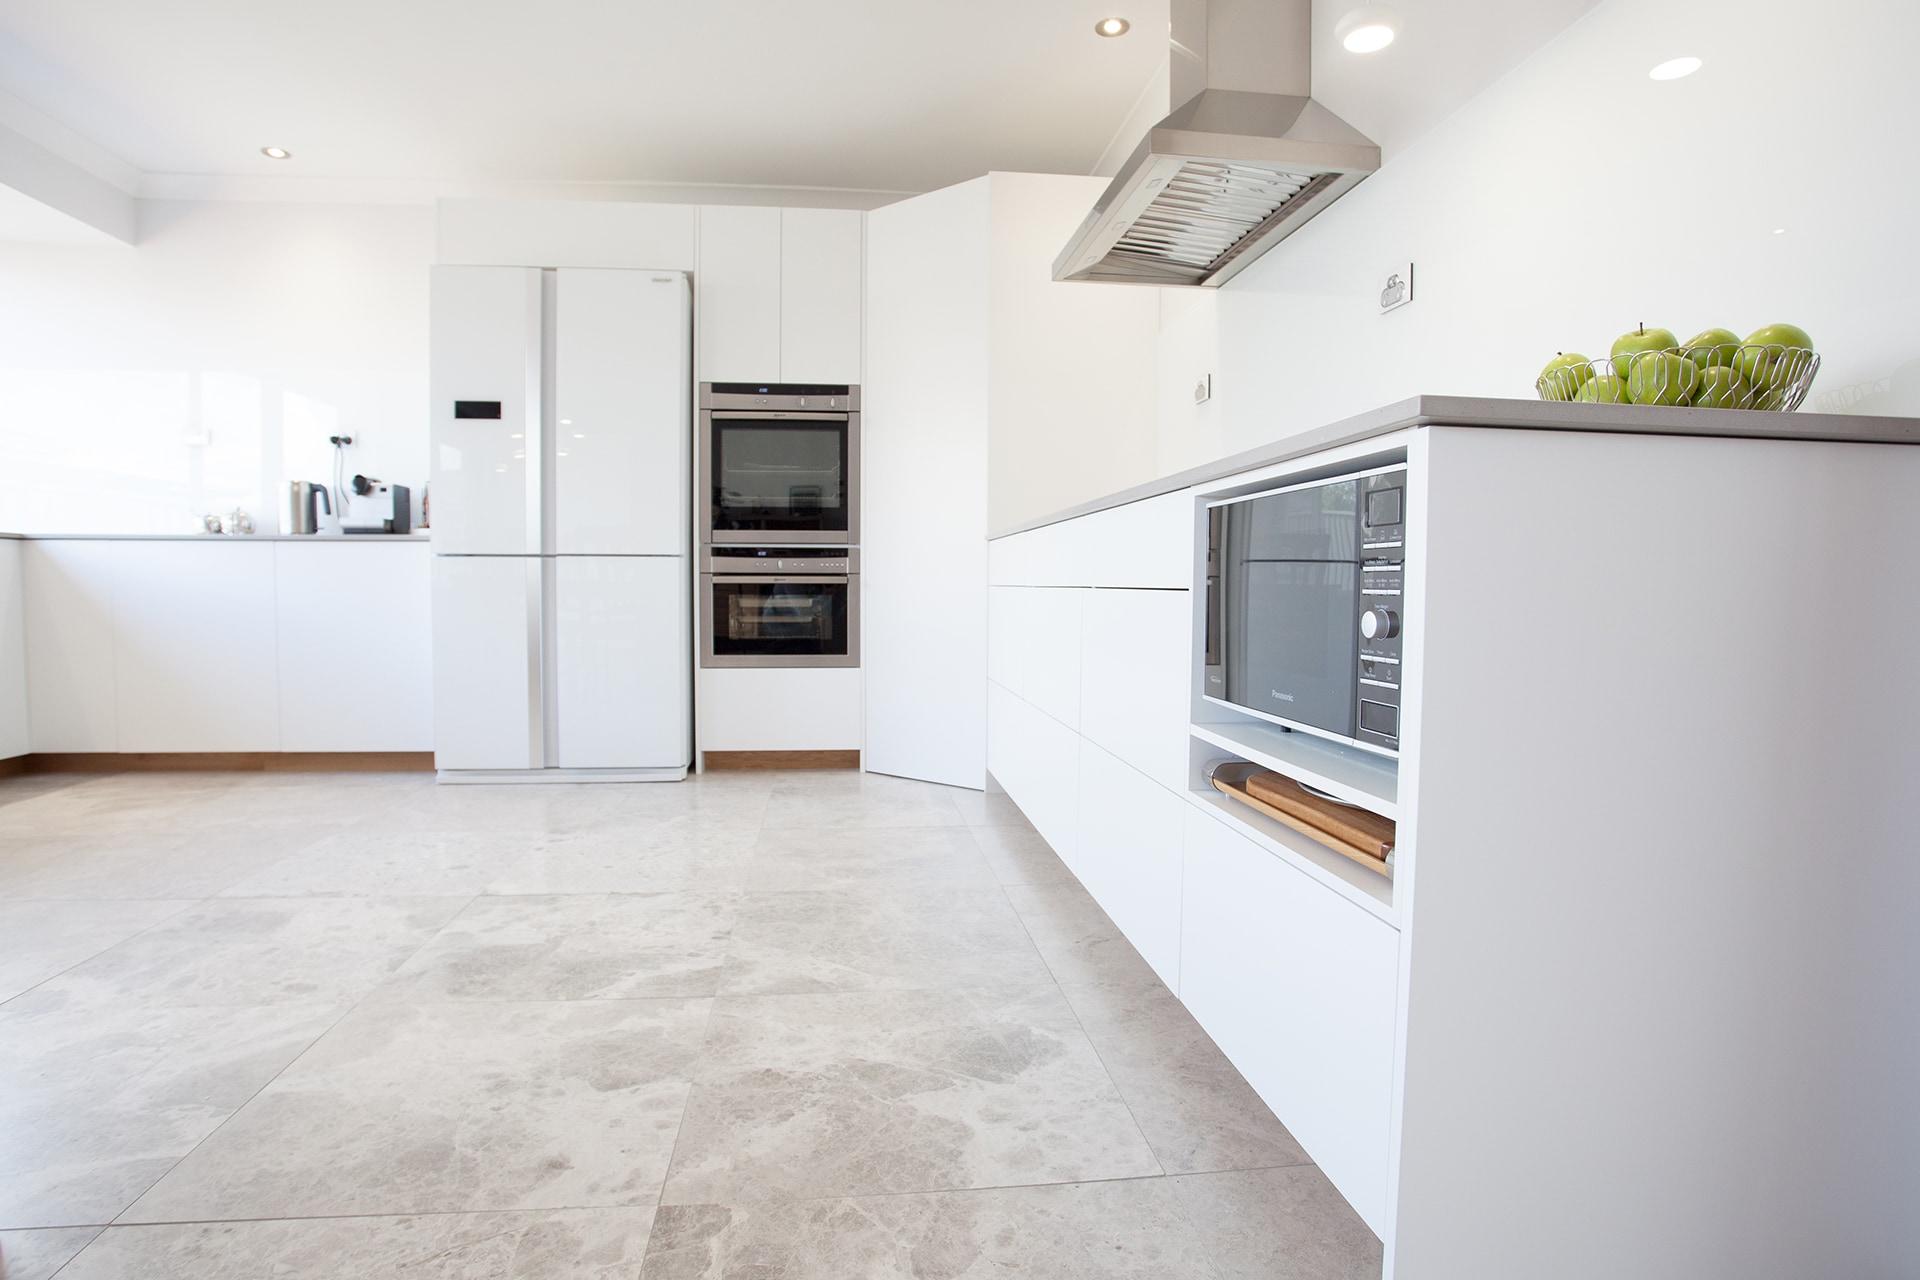 westgate kitchens kitchen renovations u0026 designs unit 3 6